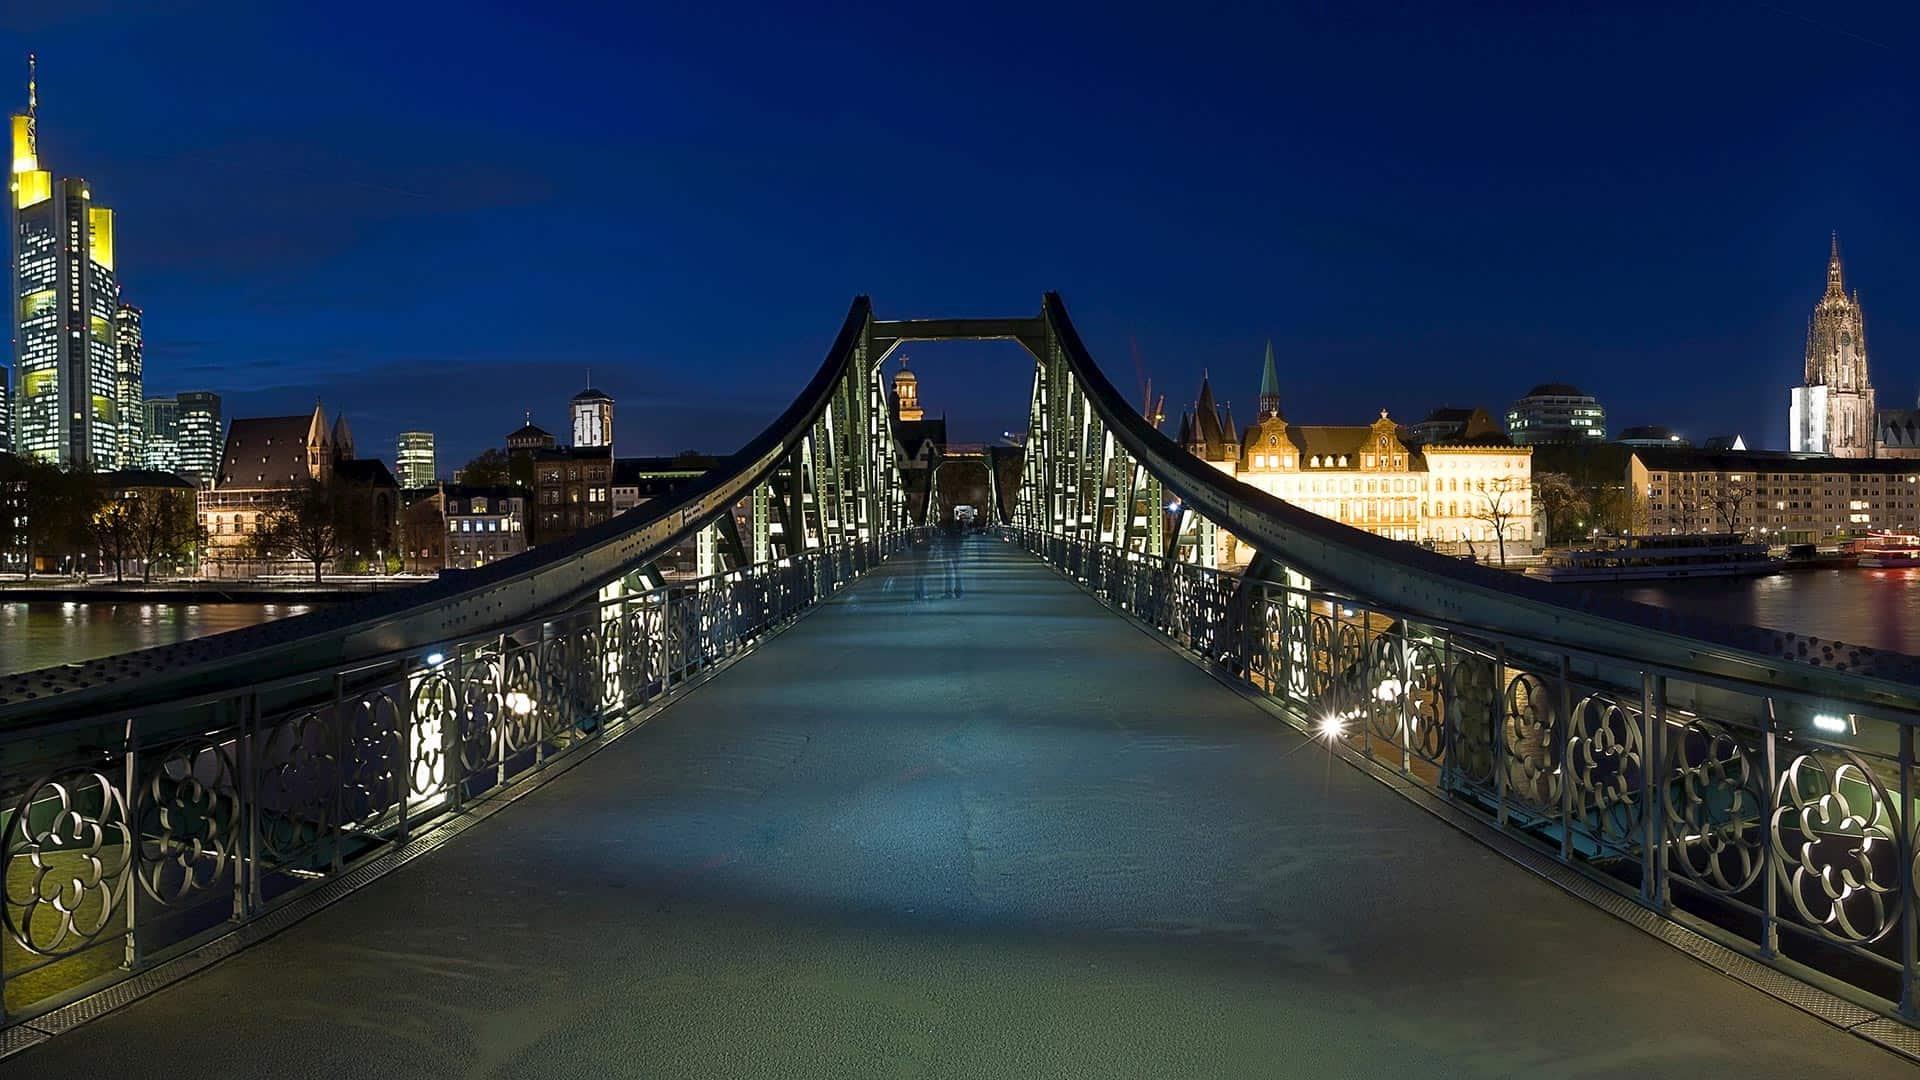 Eiserner Steg جسر العشاق المانيا